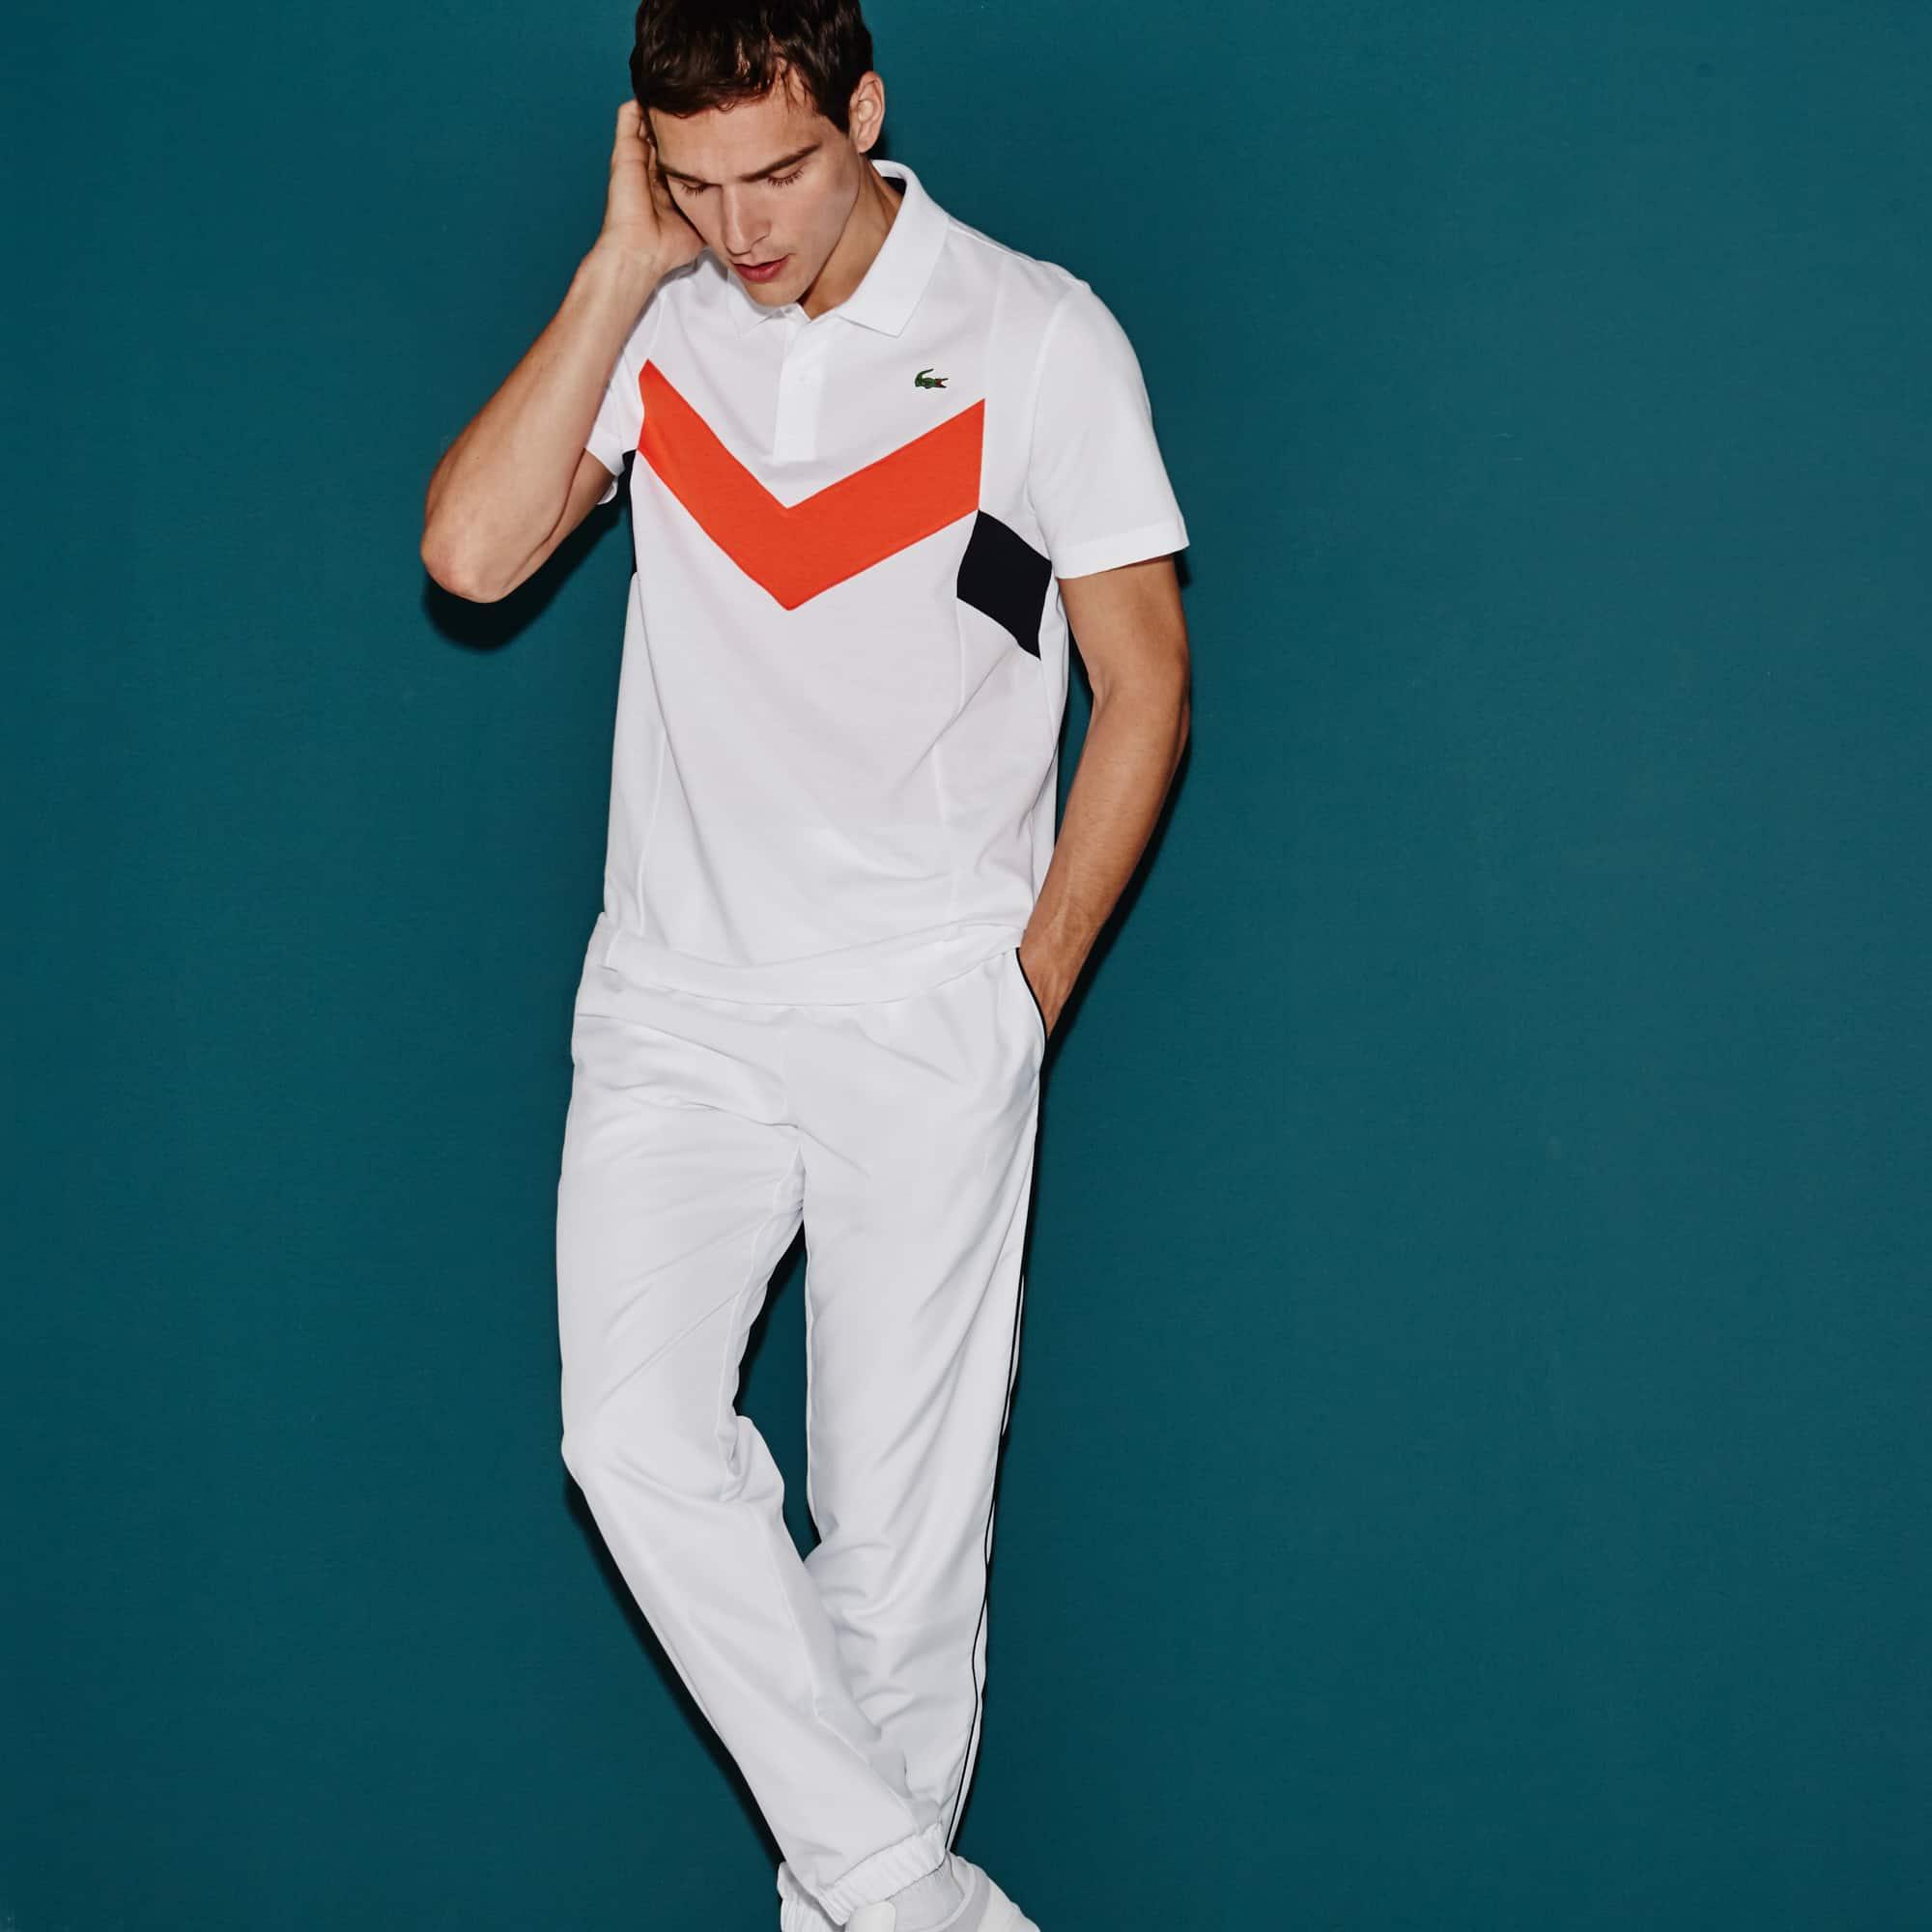 Men's Lacoste SPORT Tennis Ultra-Lightweight Colorblock Knit Polo